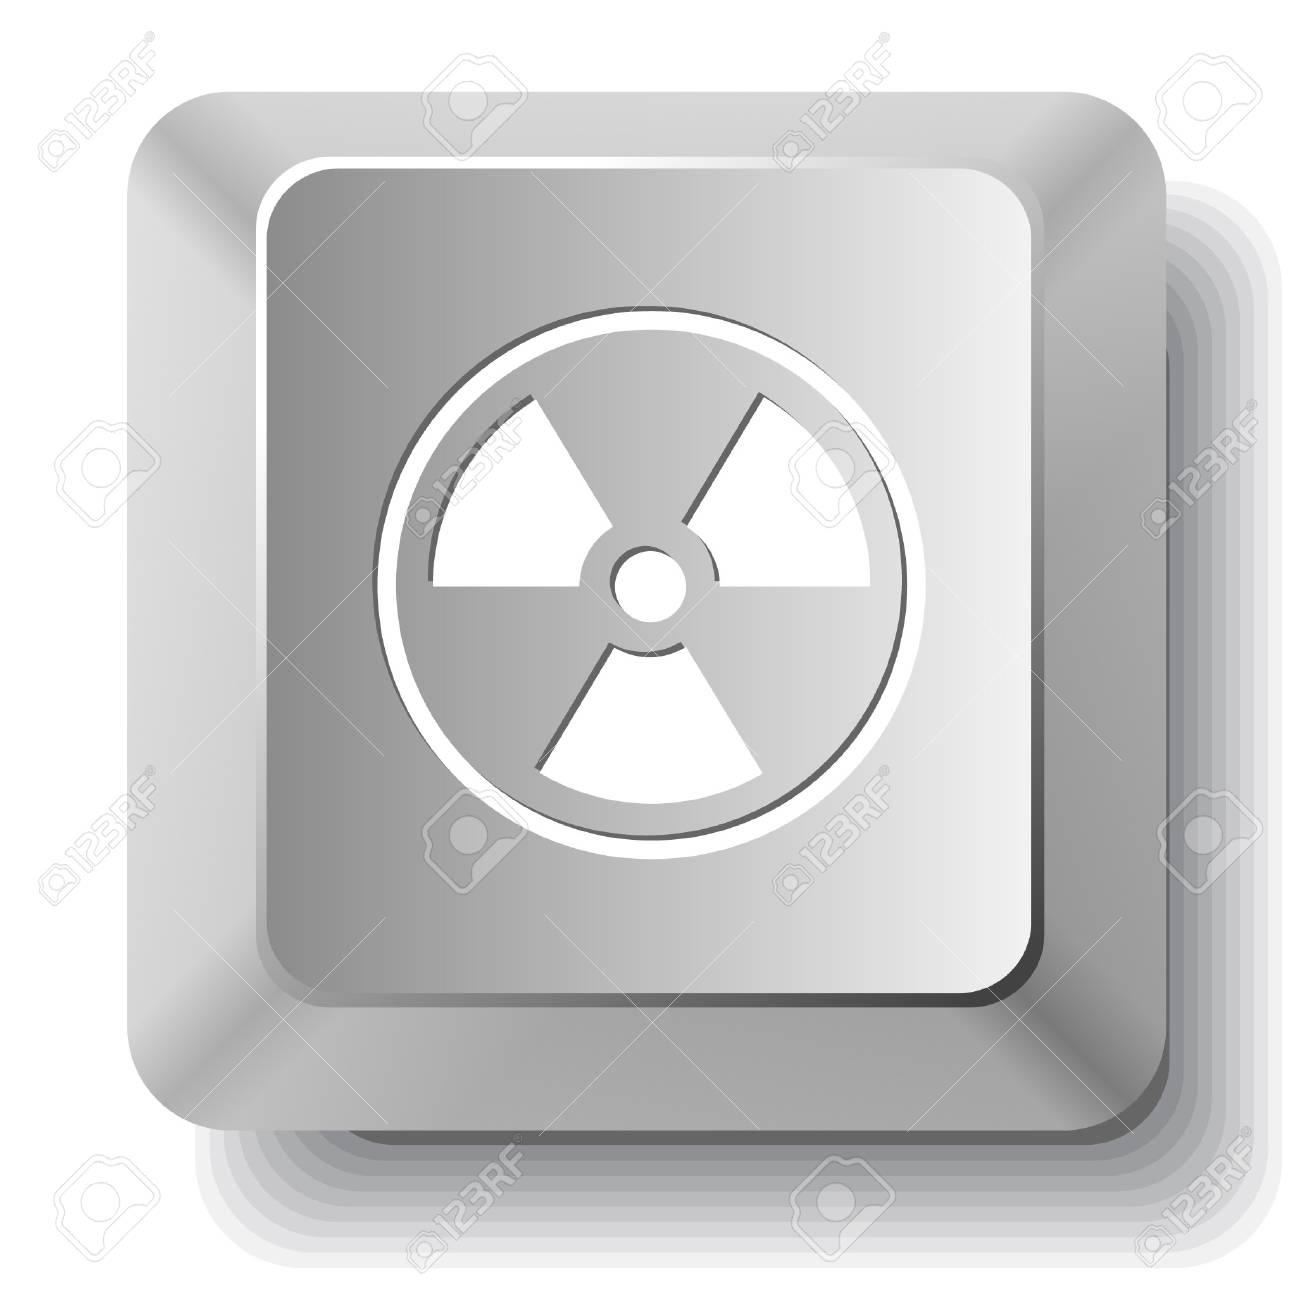 Radiation symbol. computer key. Stock Vector - 7522673